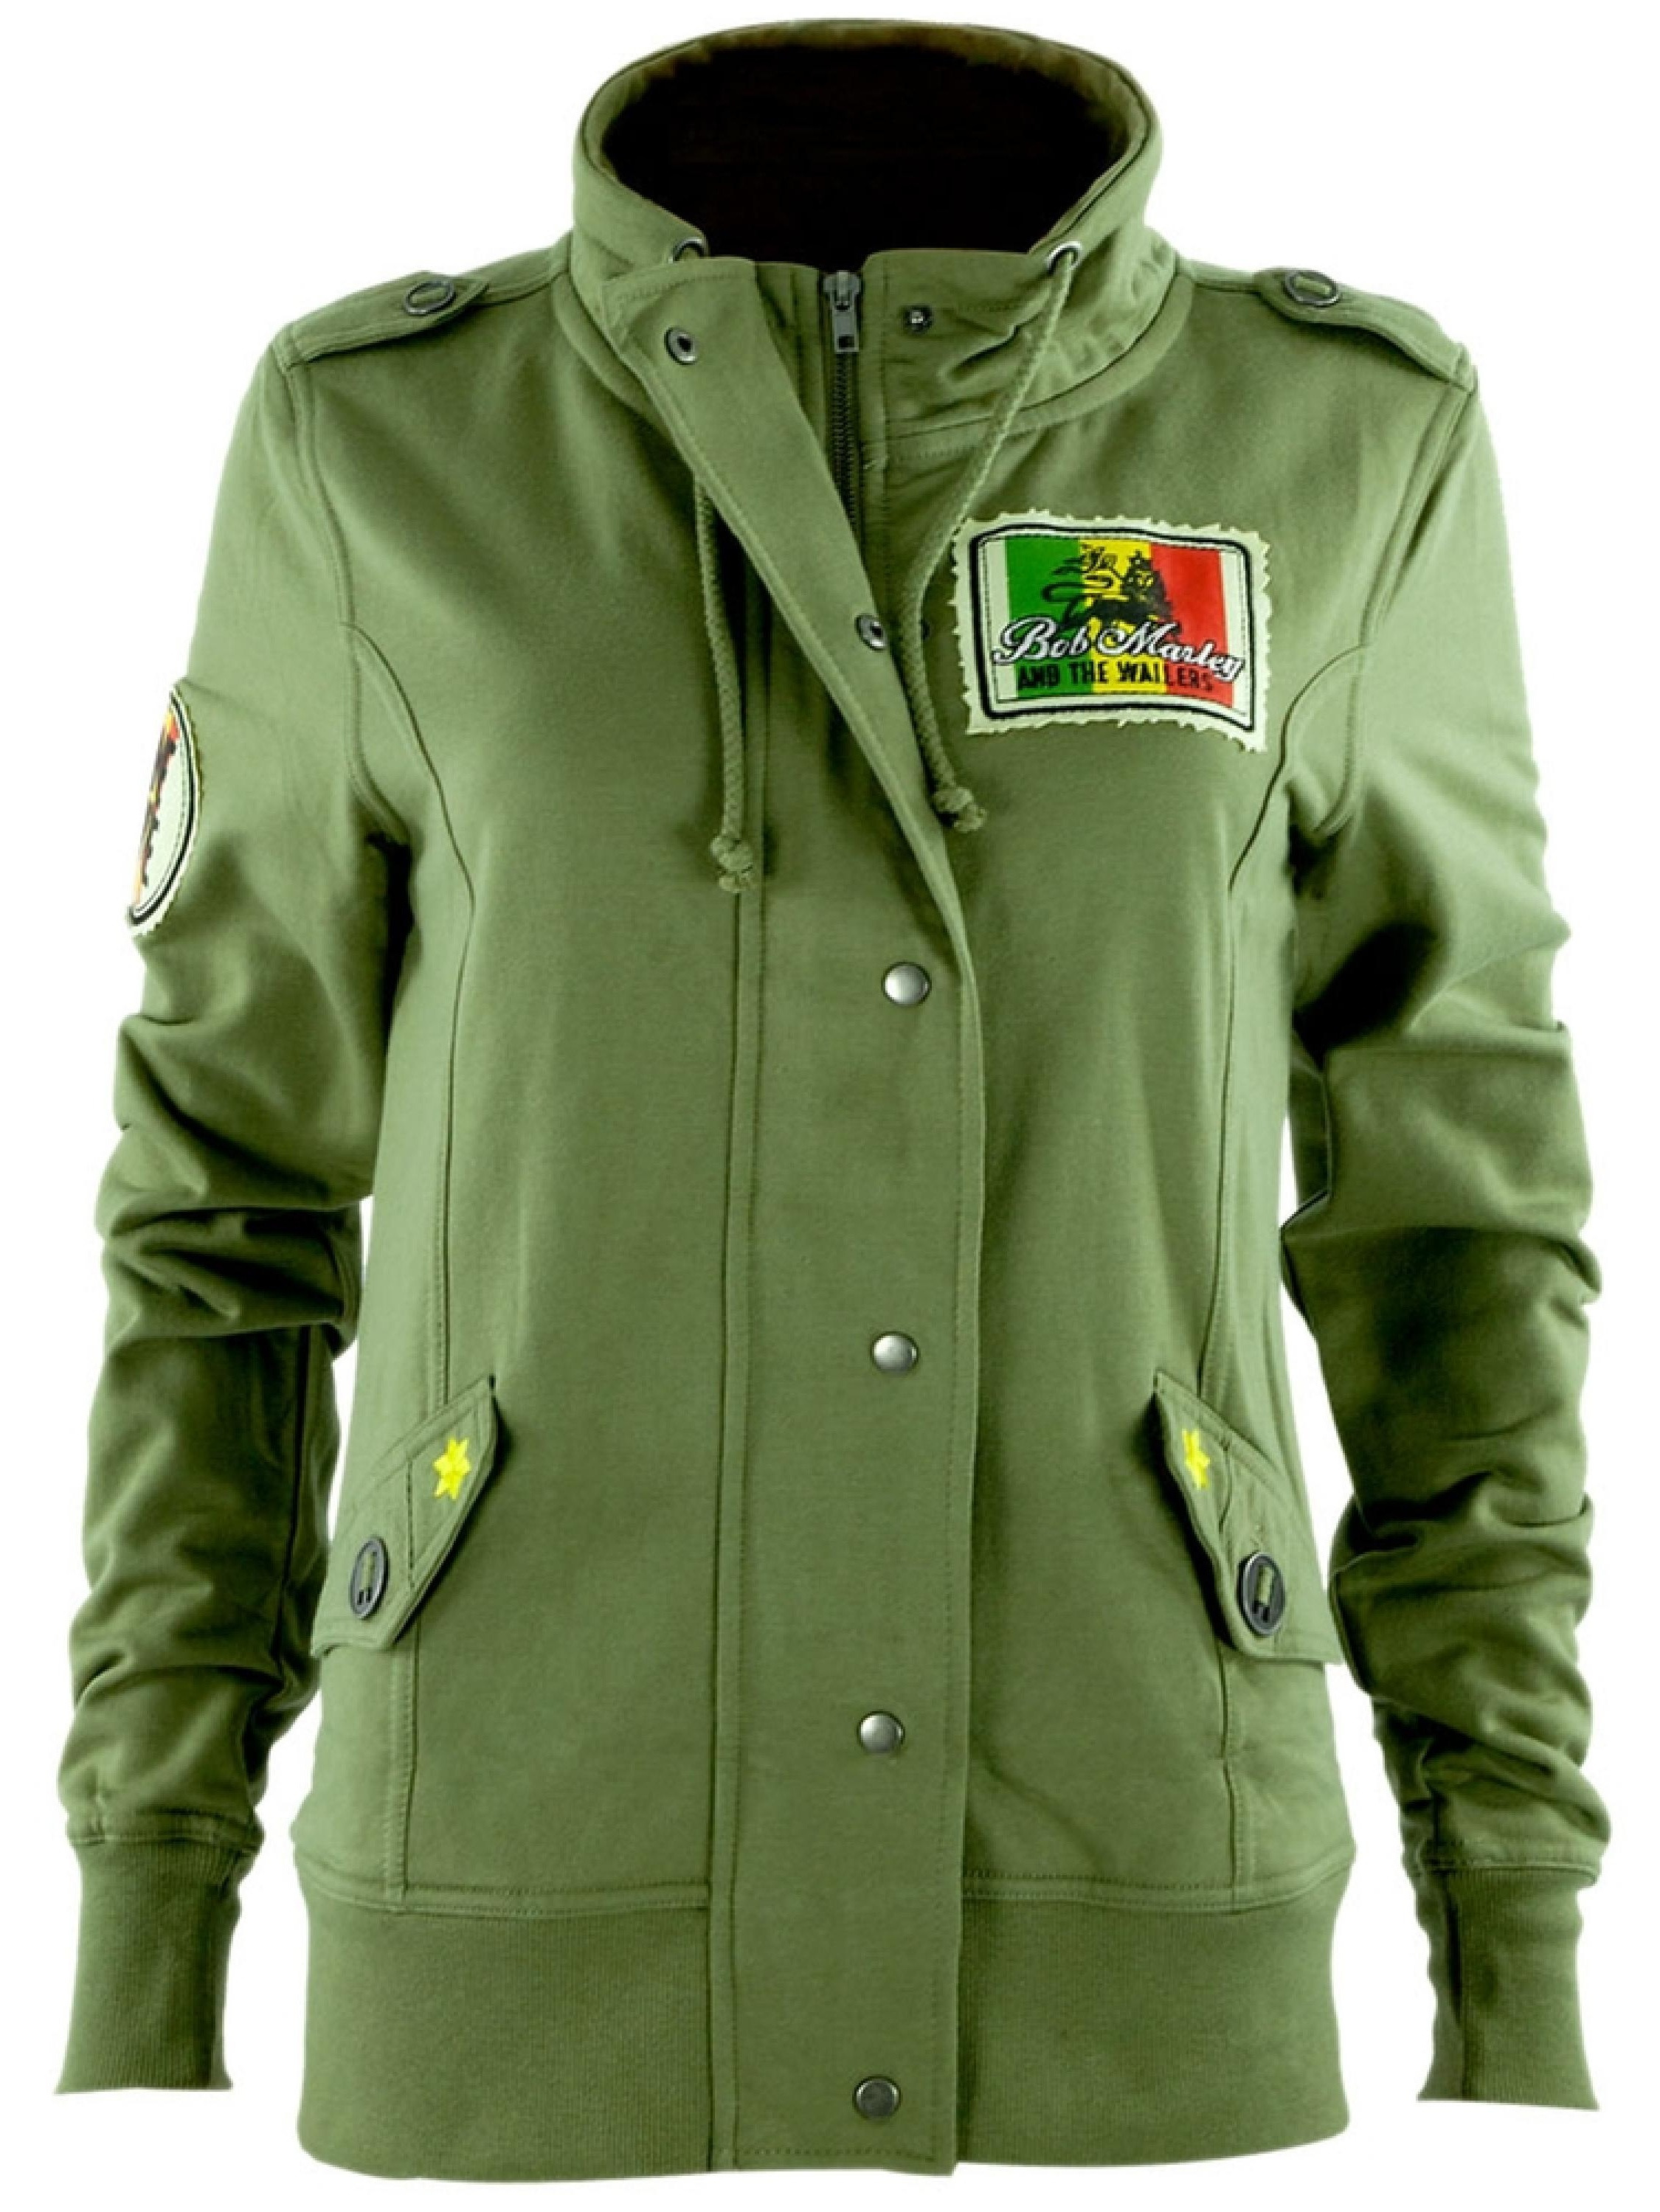 Bob Marley - Military Juniors Jacket